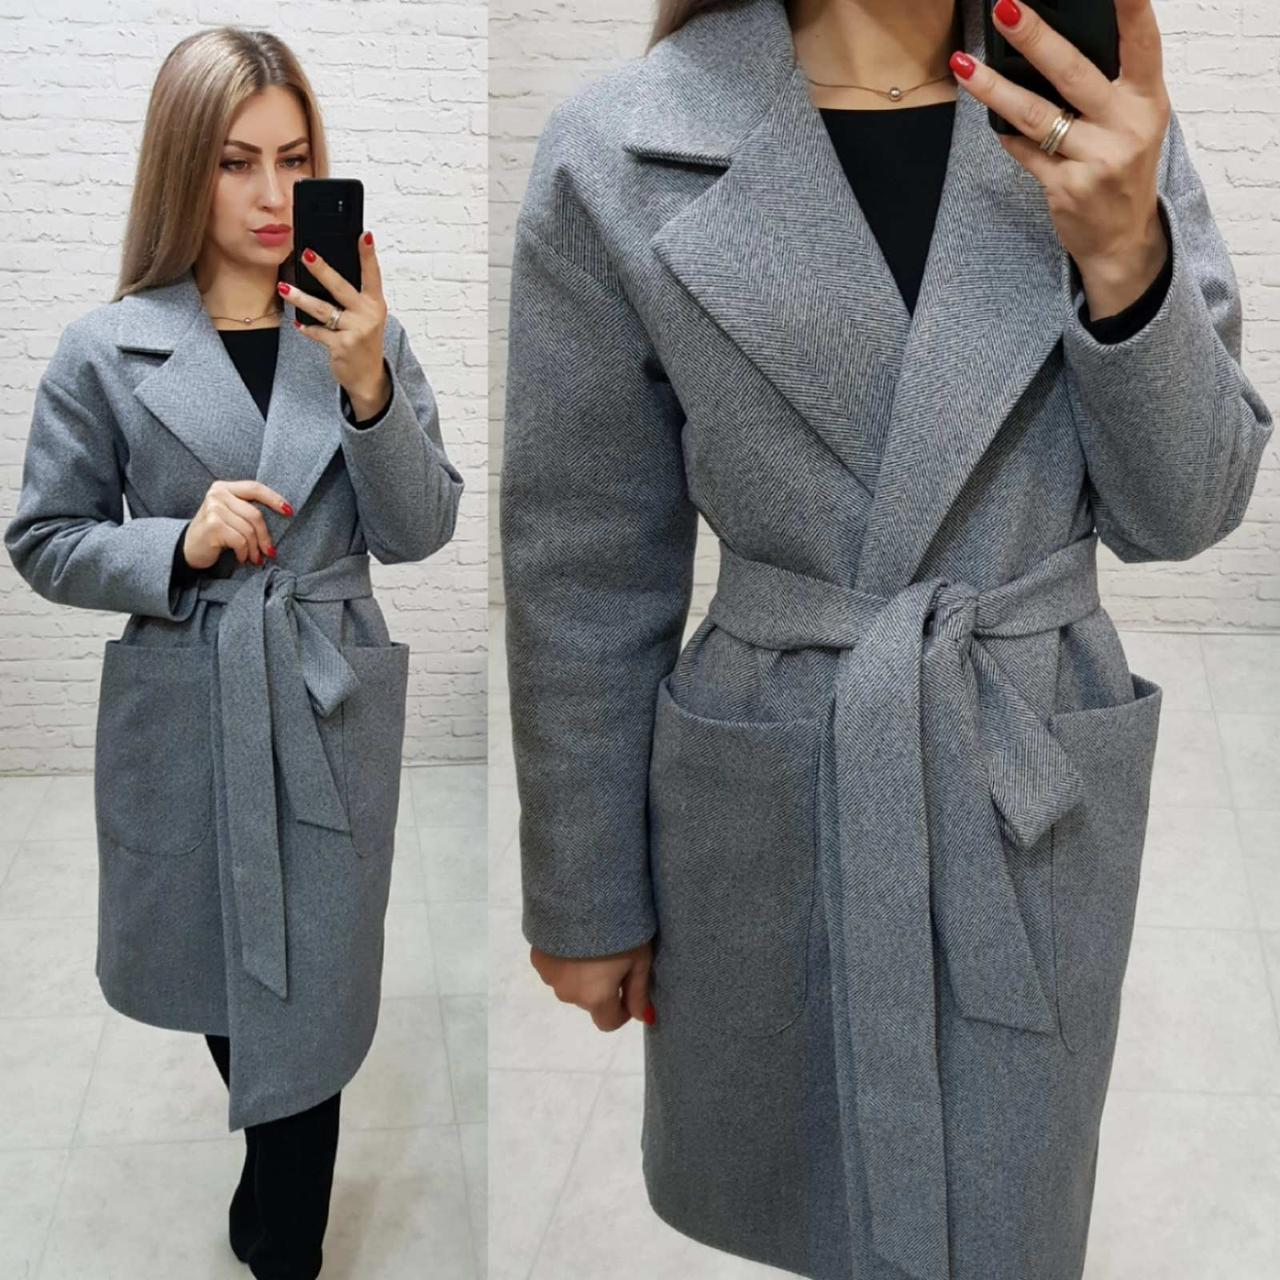 Кашемірове пальто утеплене на запах з кишенями,арт 175, колір світло сірий (1)